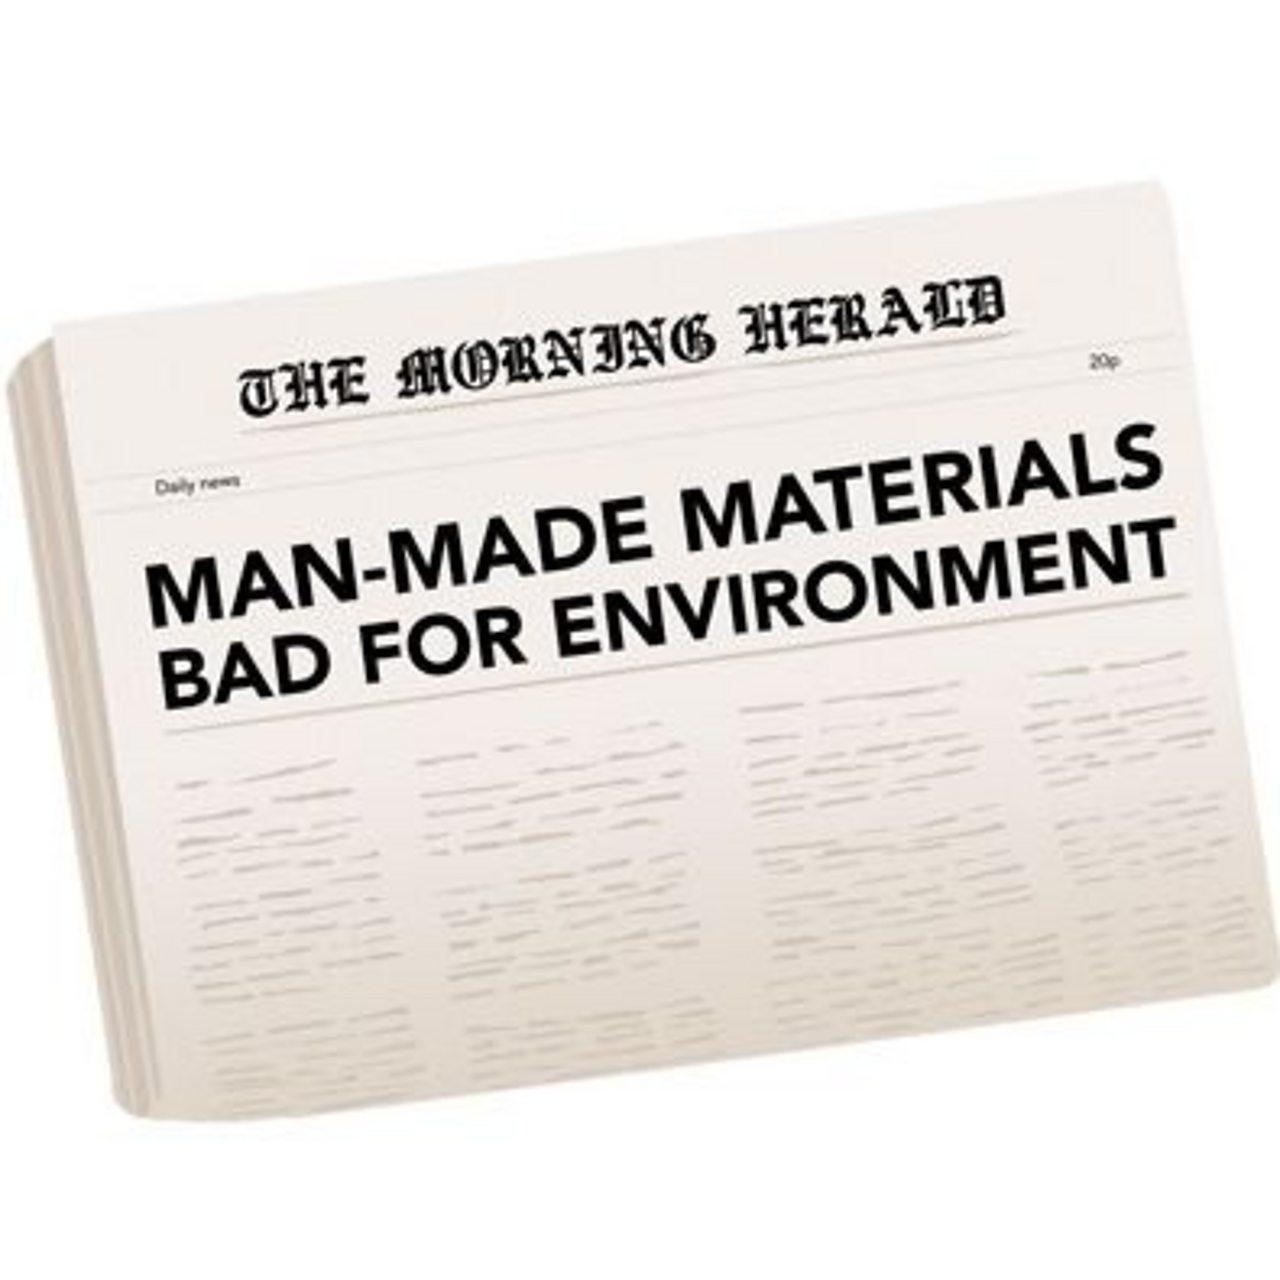 Newspaper headline 'Man-made materials bad for environment'